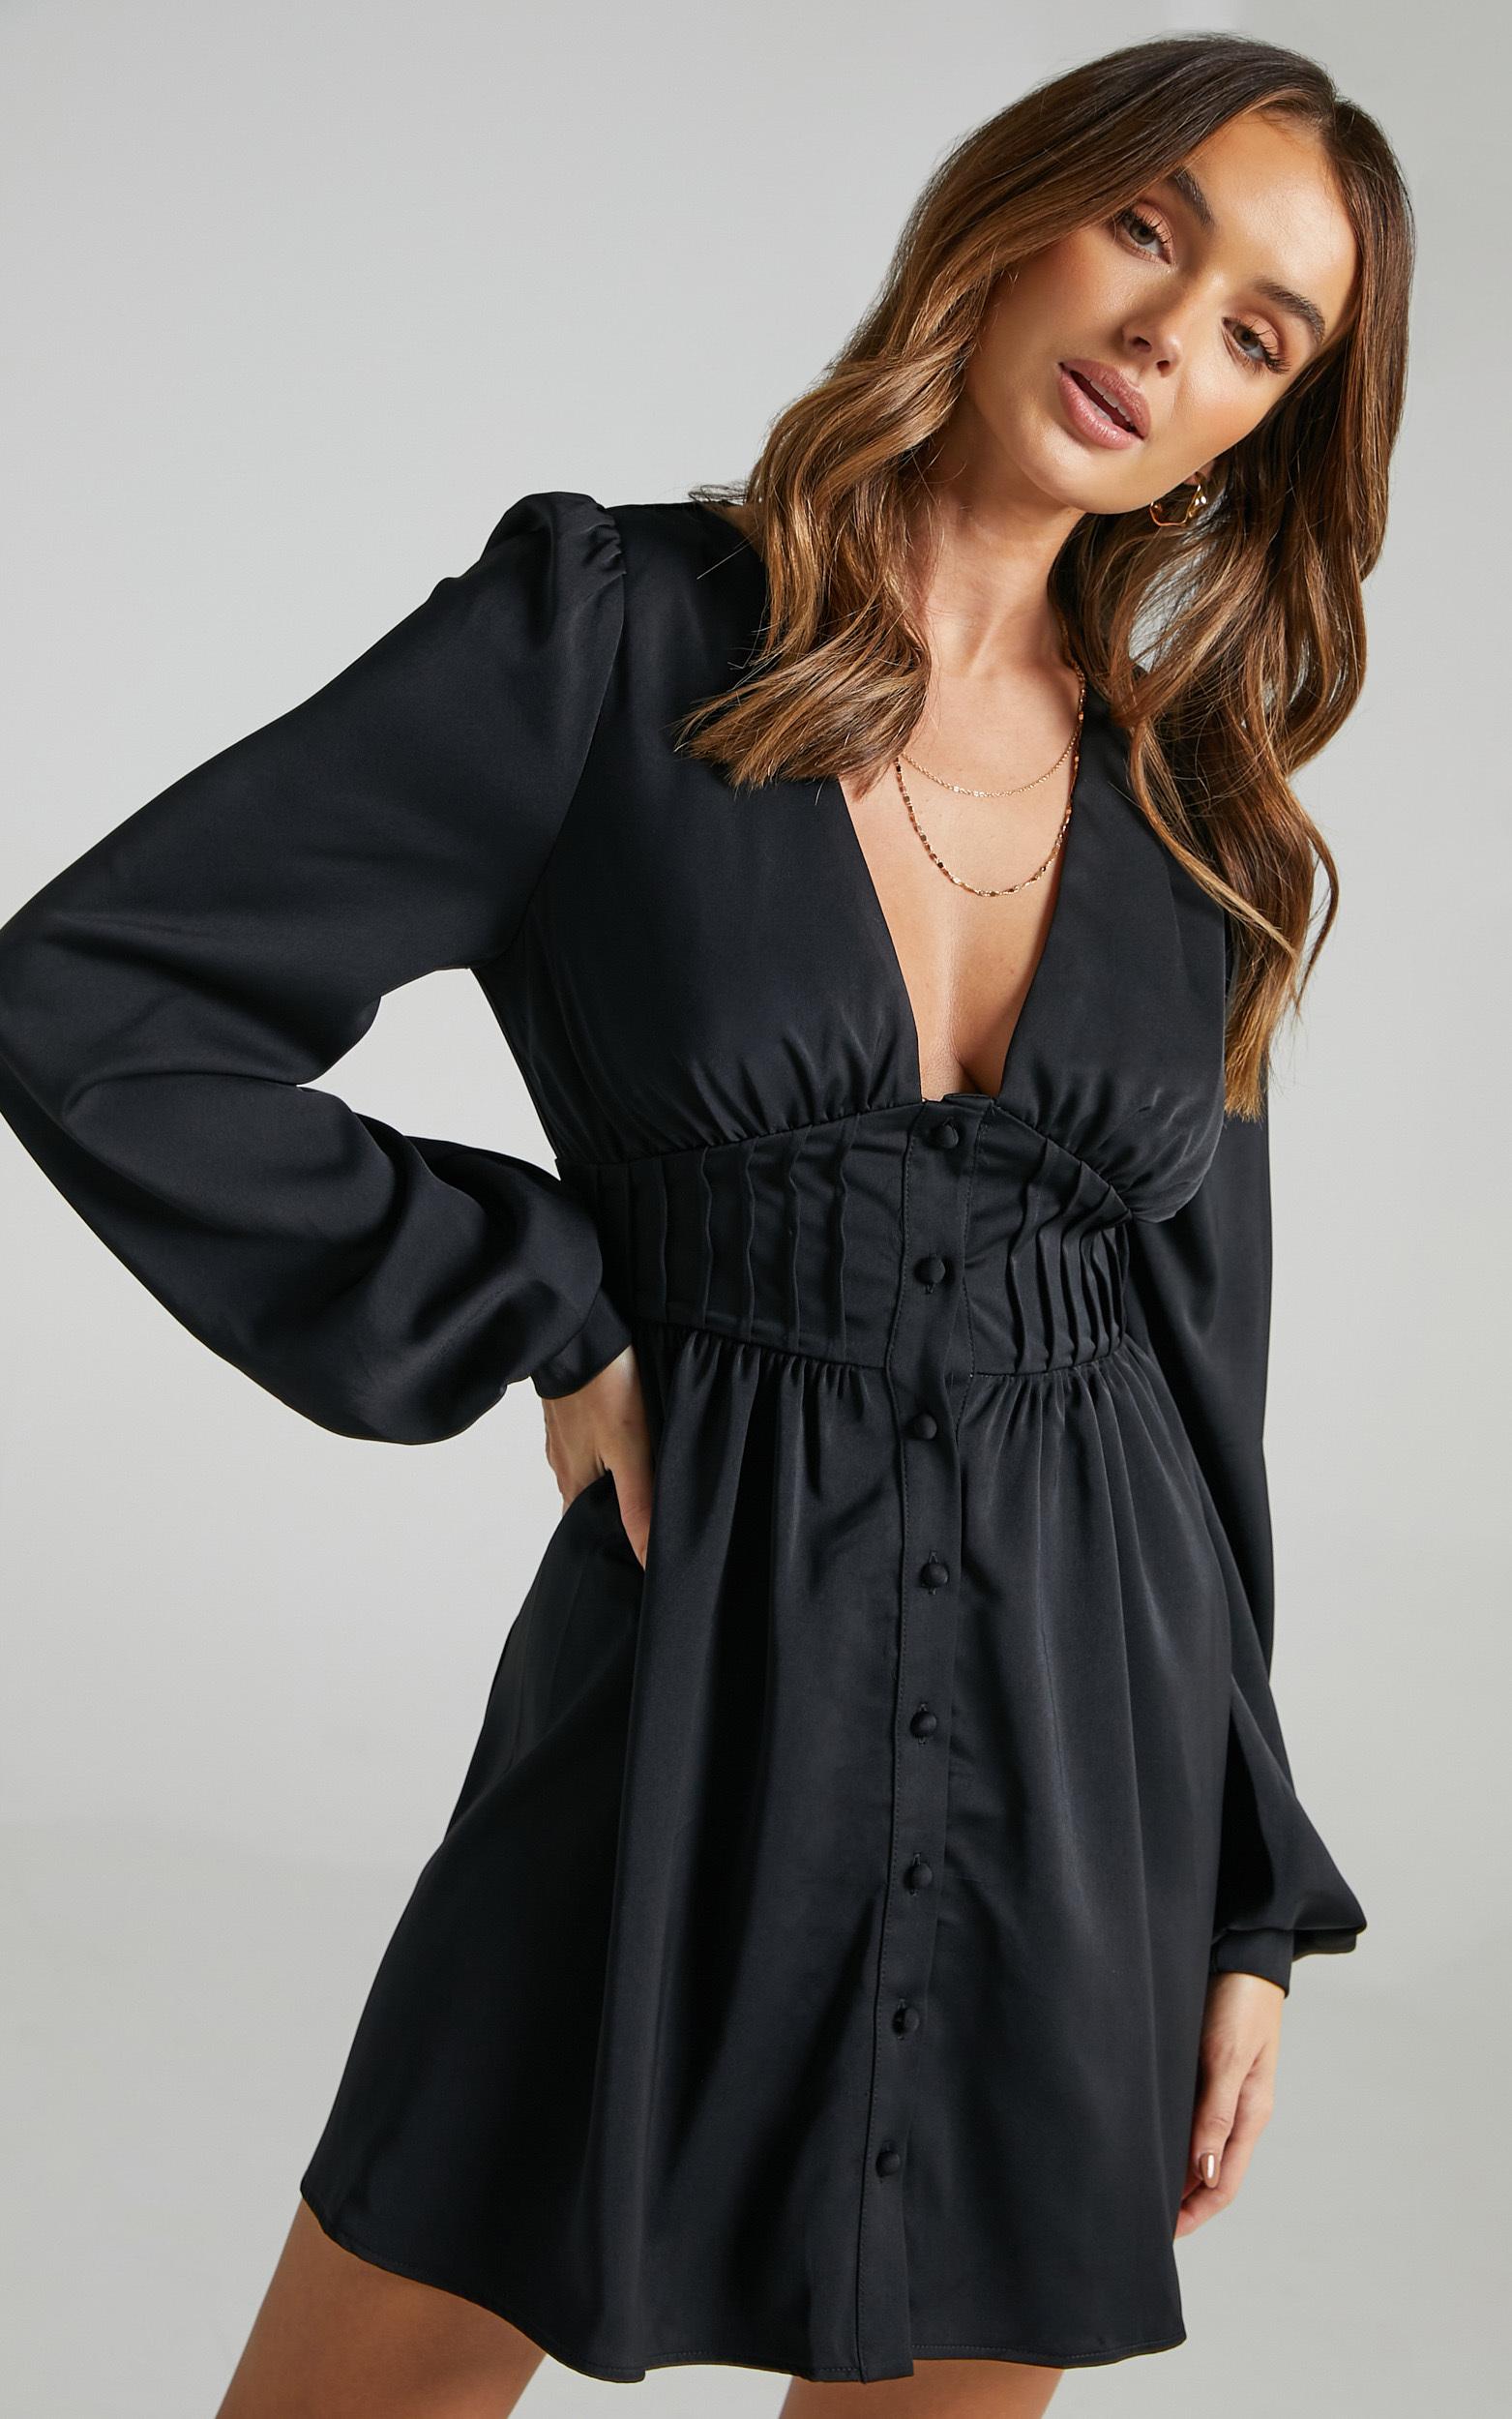 Barley Long Sleeve Corset Mini Dress in Black - 06, BLK1, hi-res image number null